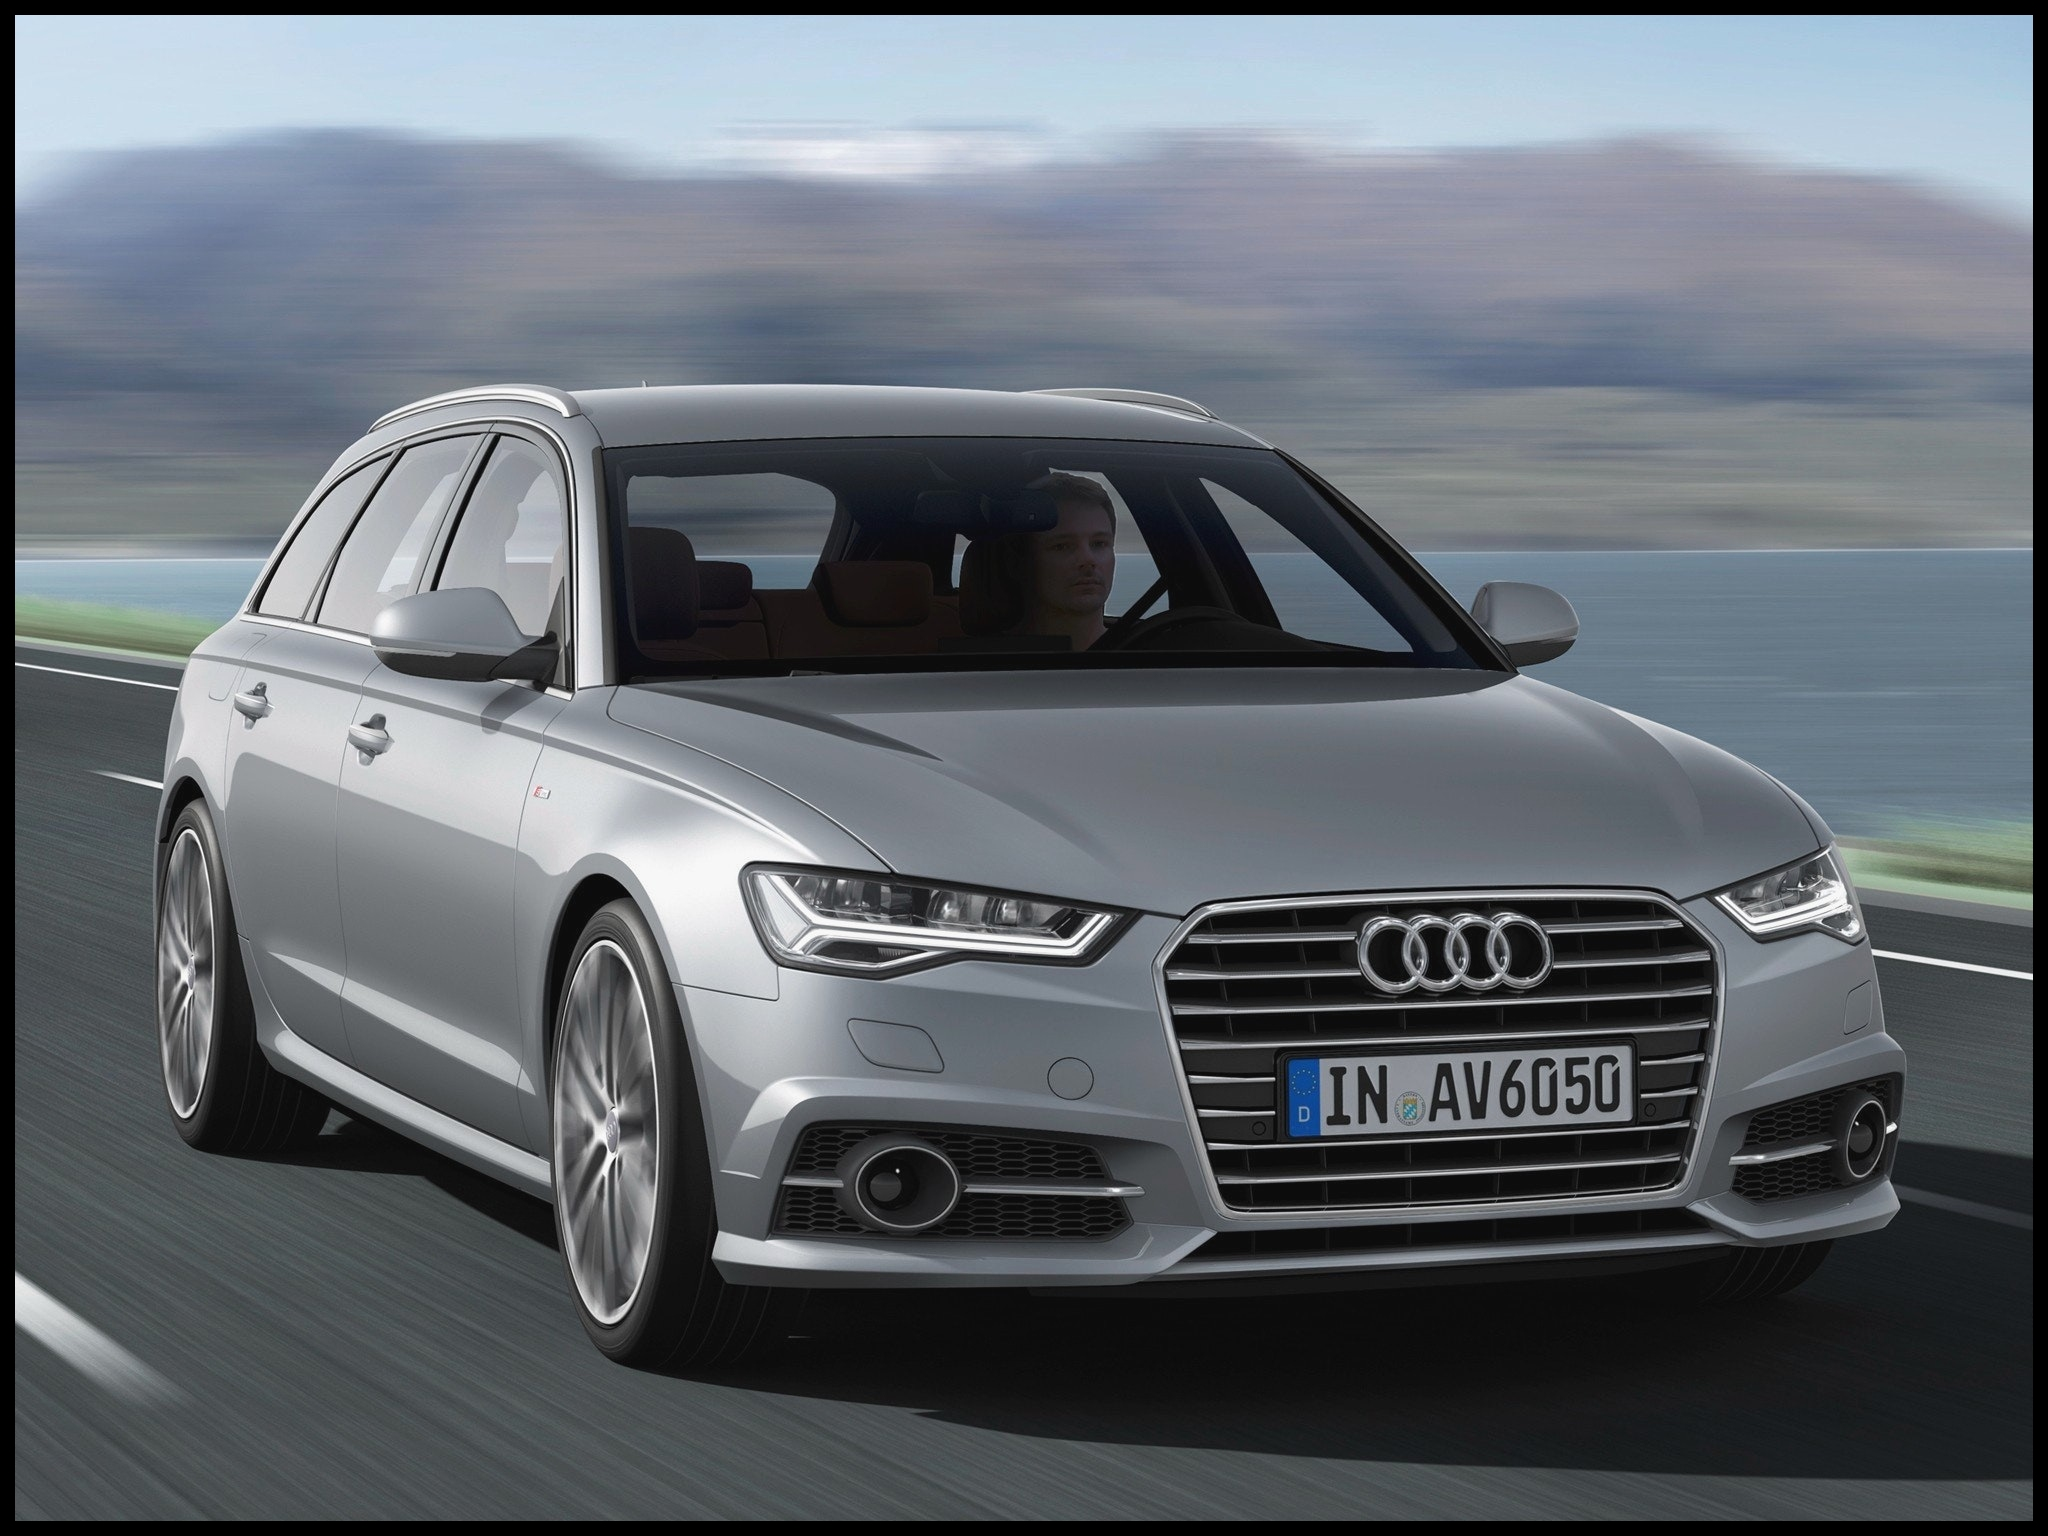 2018 Audi A6 Specs and Review High Definition Audi A6 Avant 2017 1600 0d Auto 2018